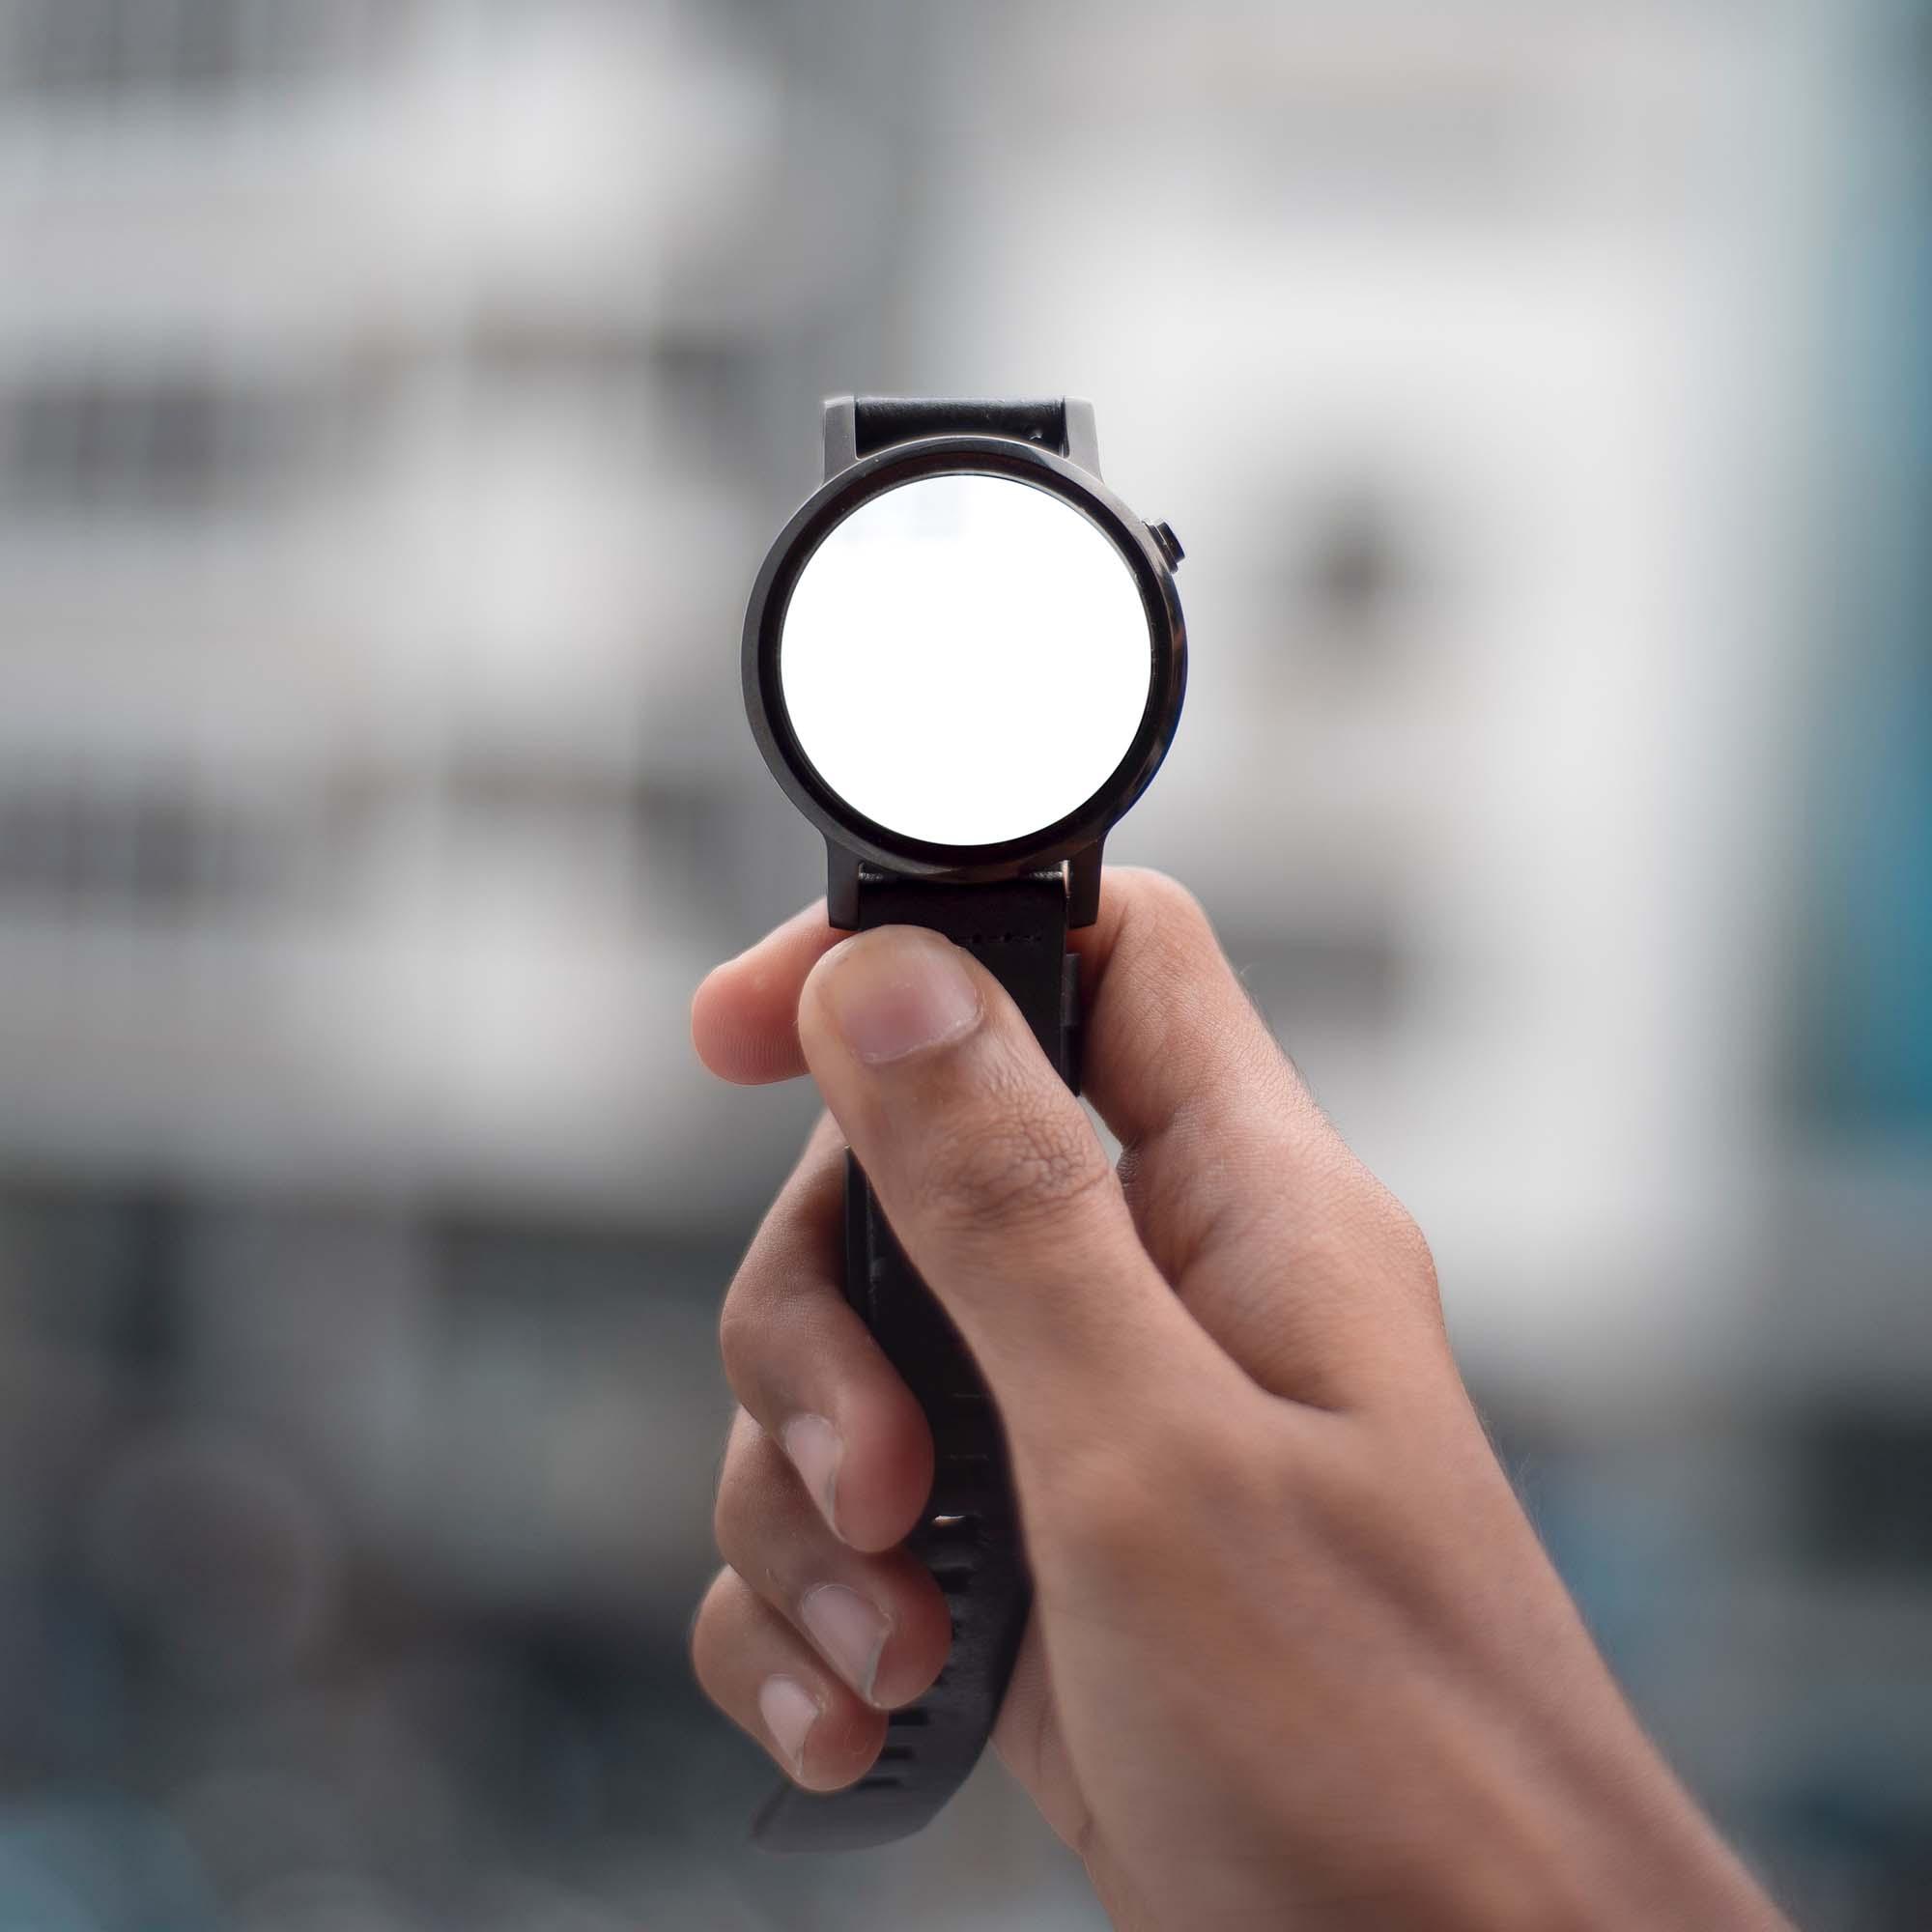 Smartwatch Mockup 2